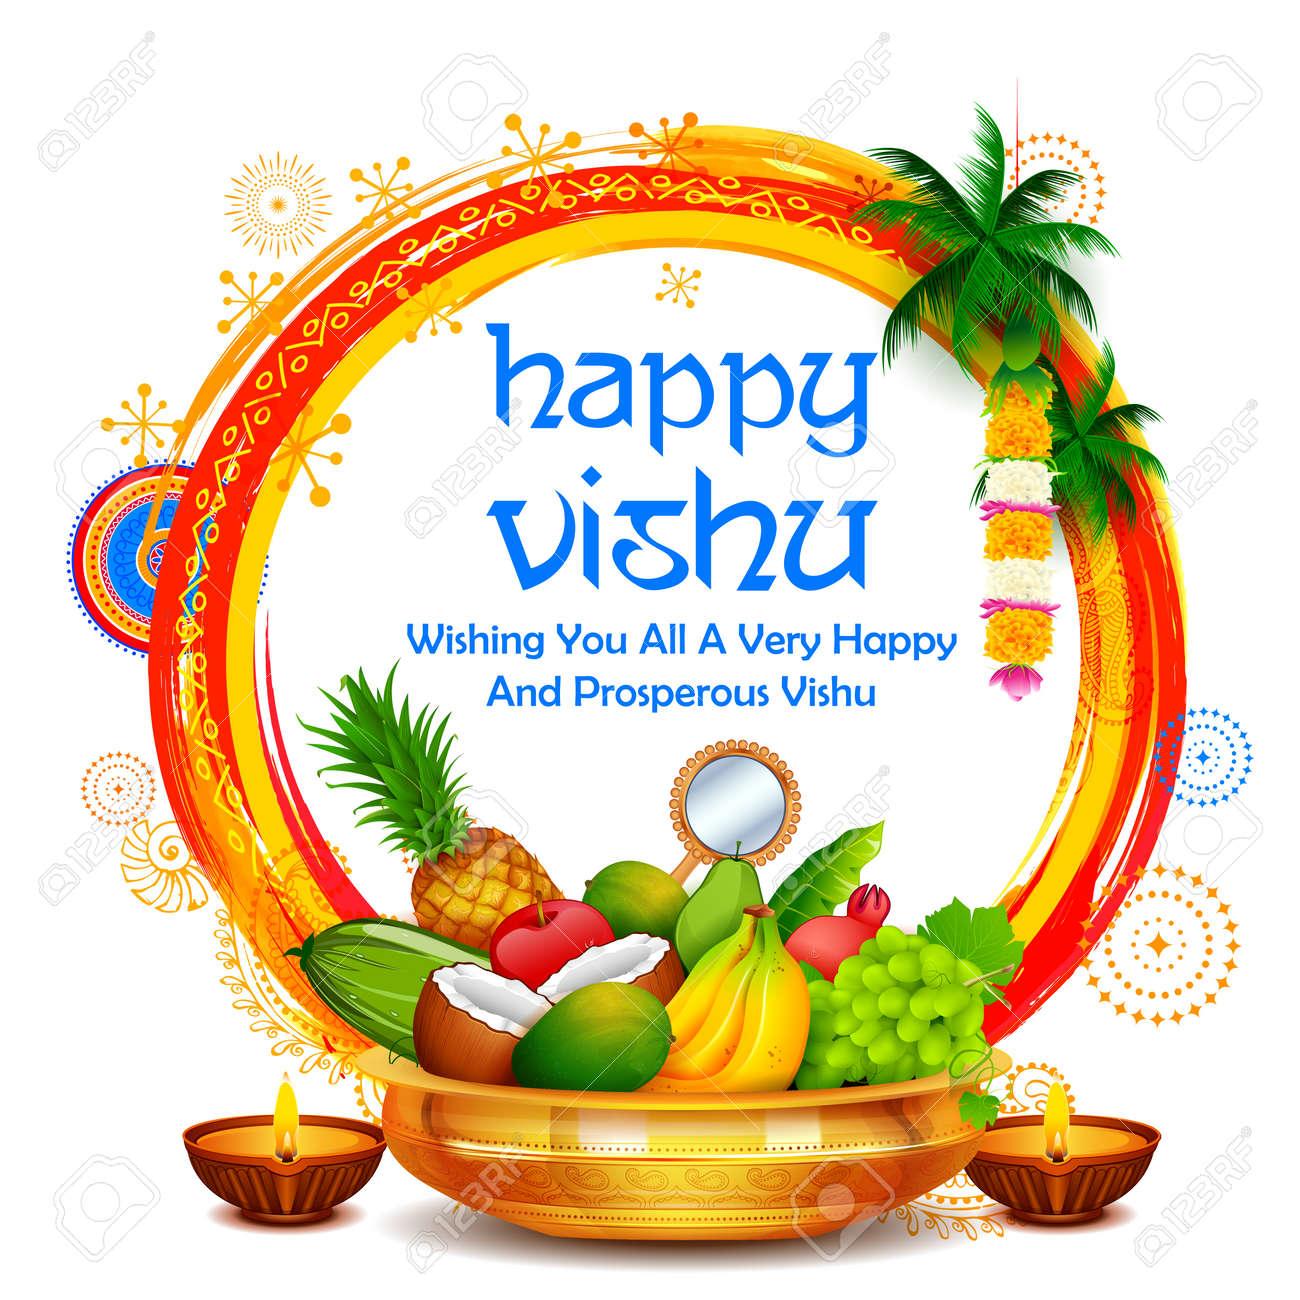 Happy New Year Hindu 56